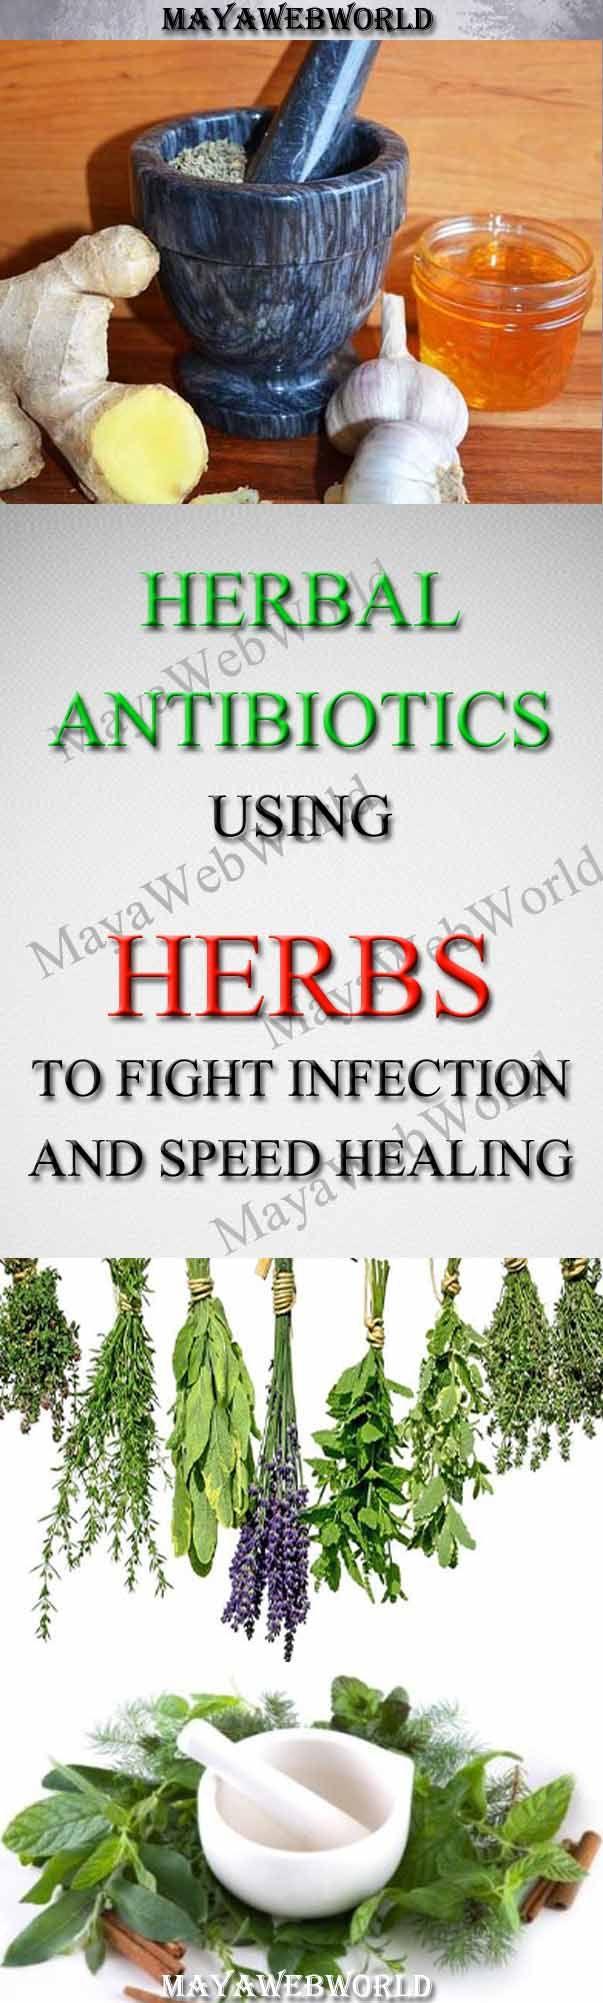 Herbal Antibiotics – Using Herbs to Fight Infection and Speed Healing – MayaWebWorld